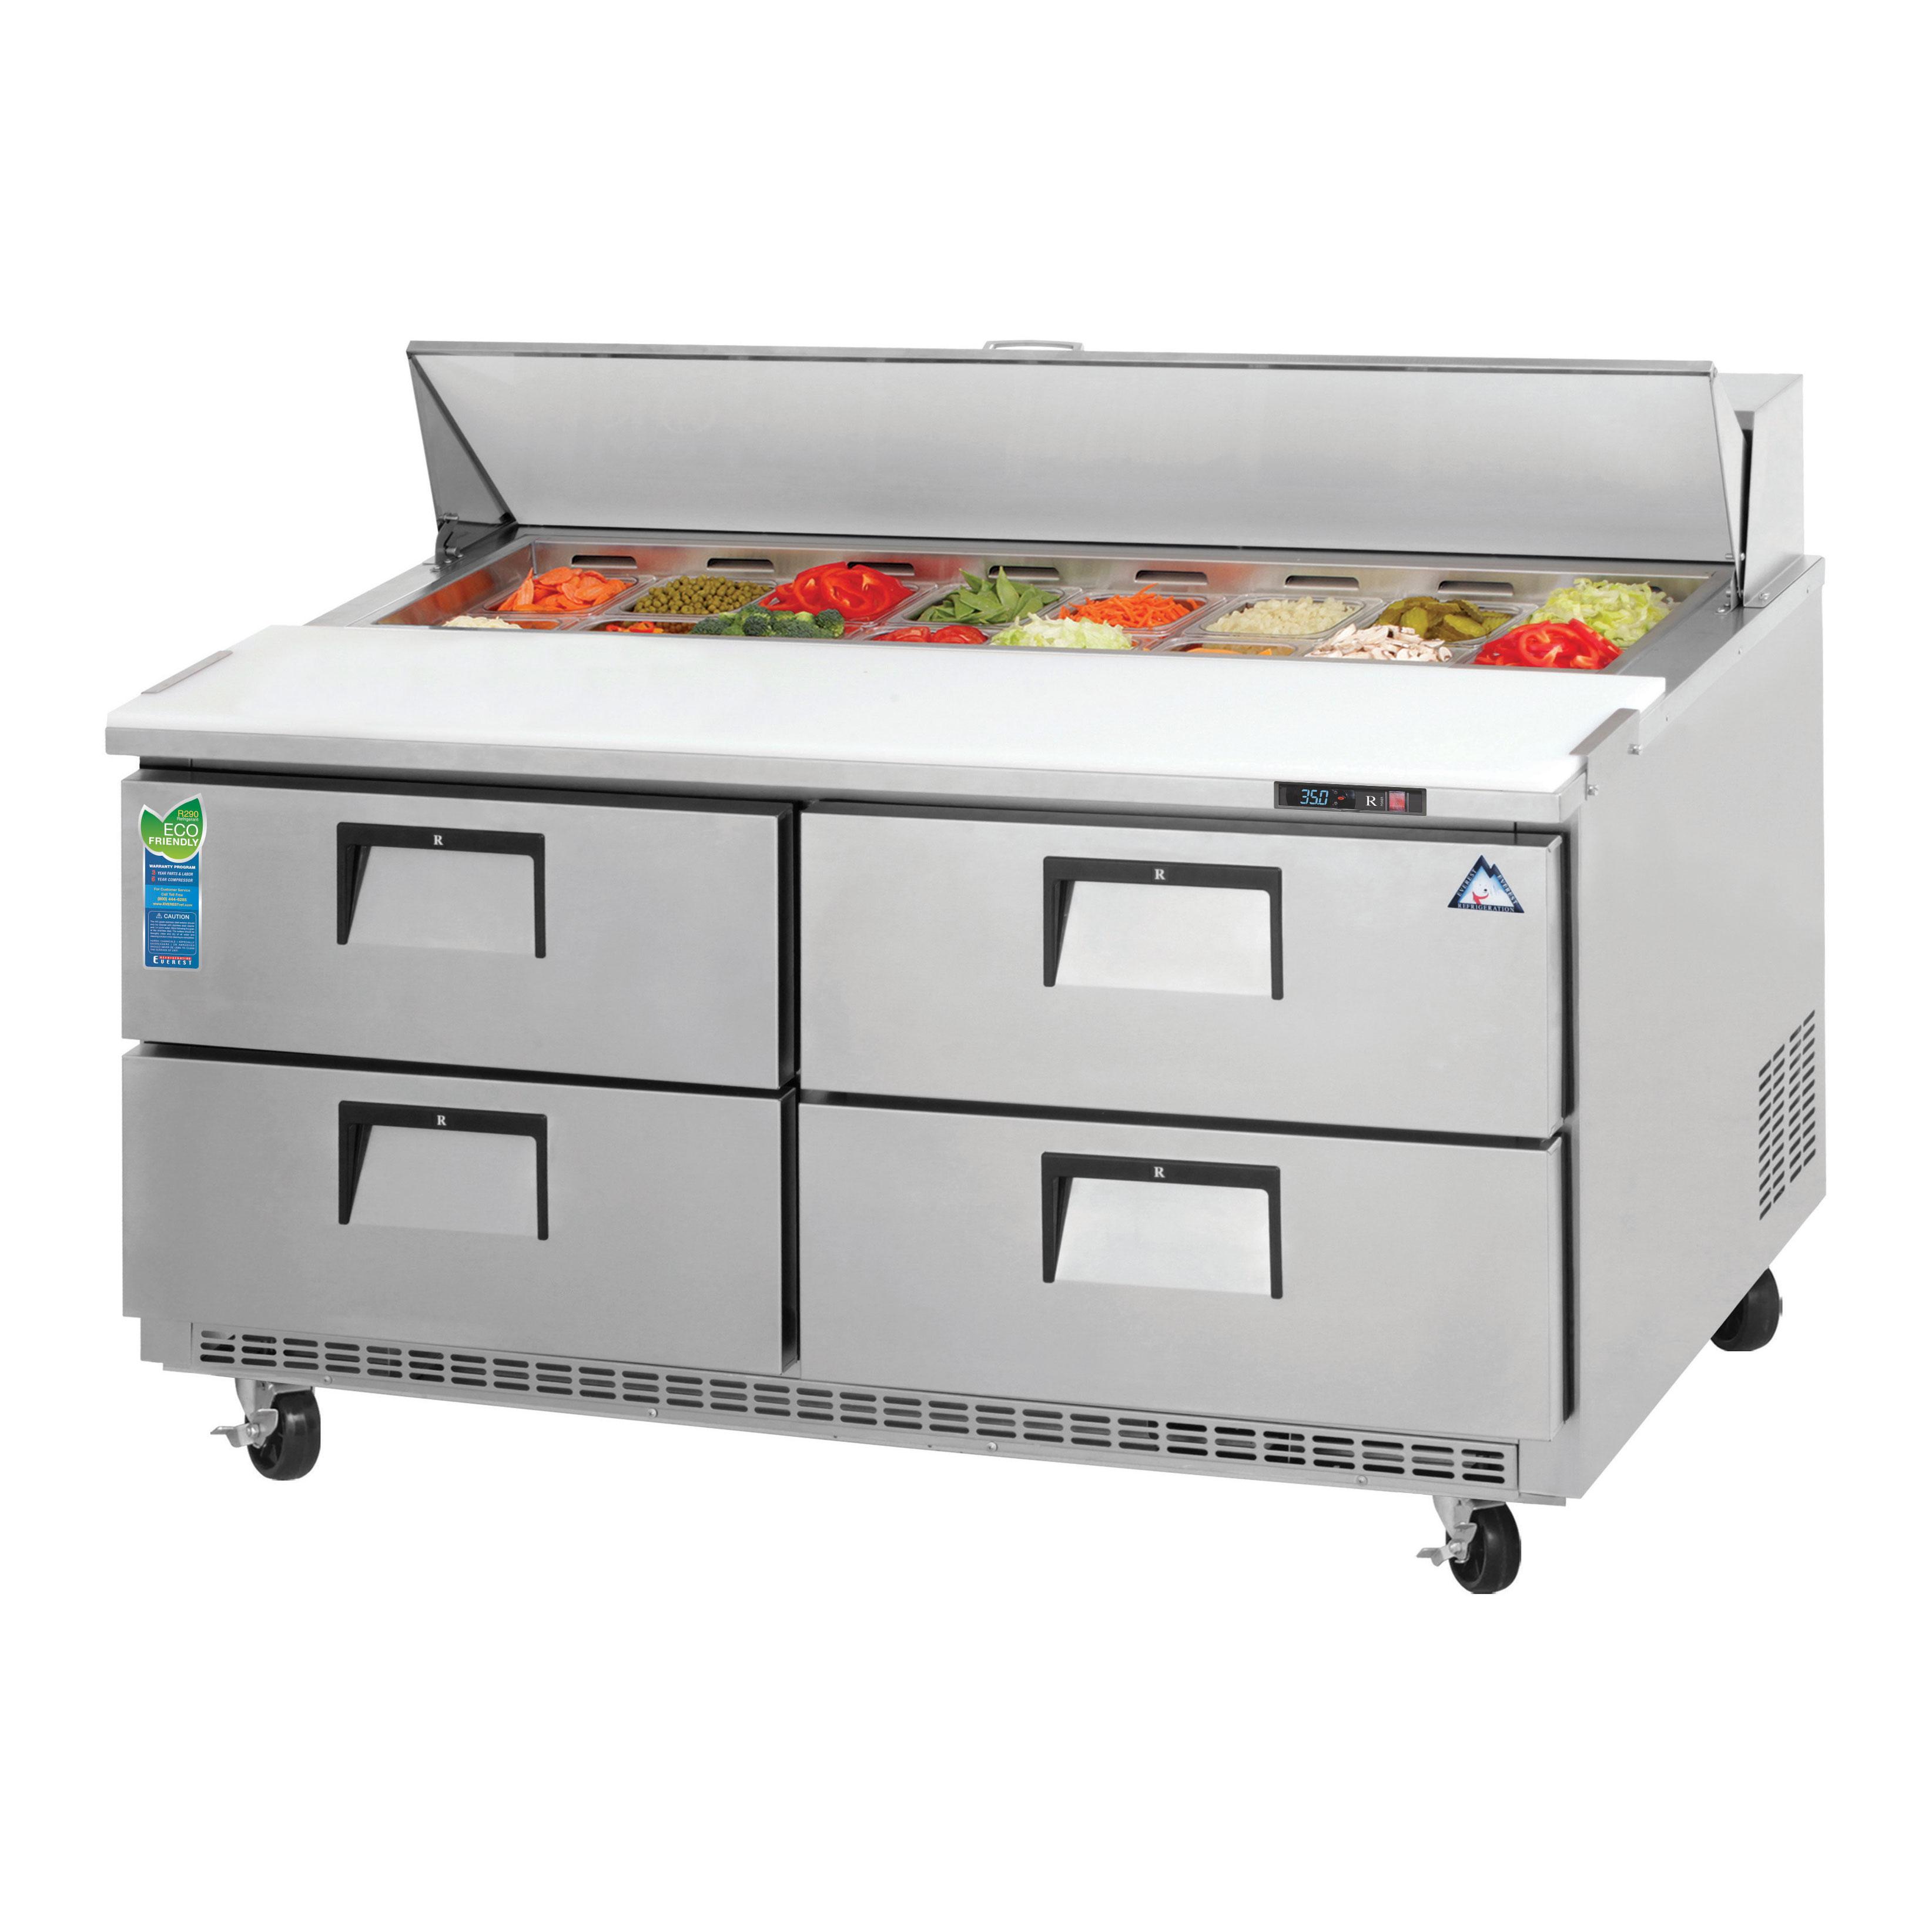 Everest Refrigeration EPBNWR2-D4 refrigerated counter, sandwich / salad unit